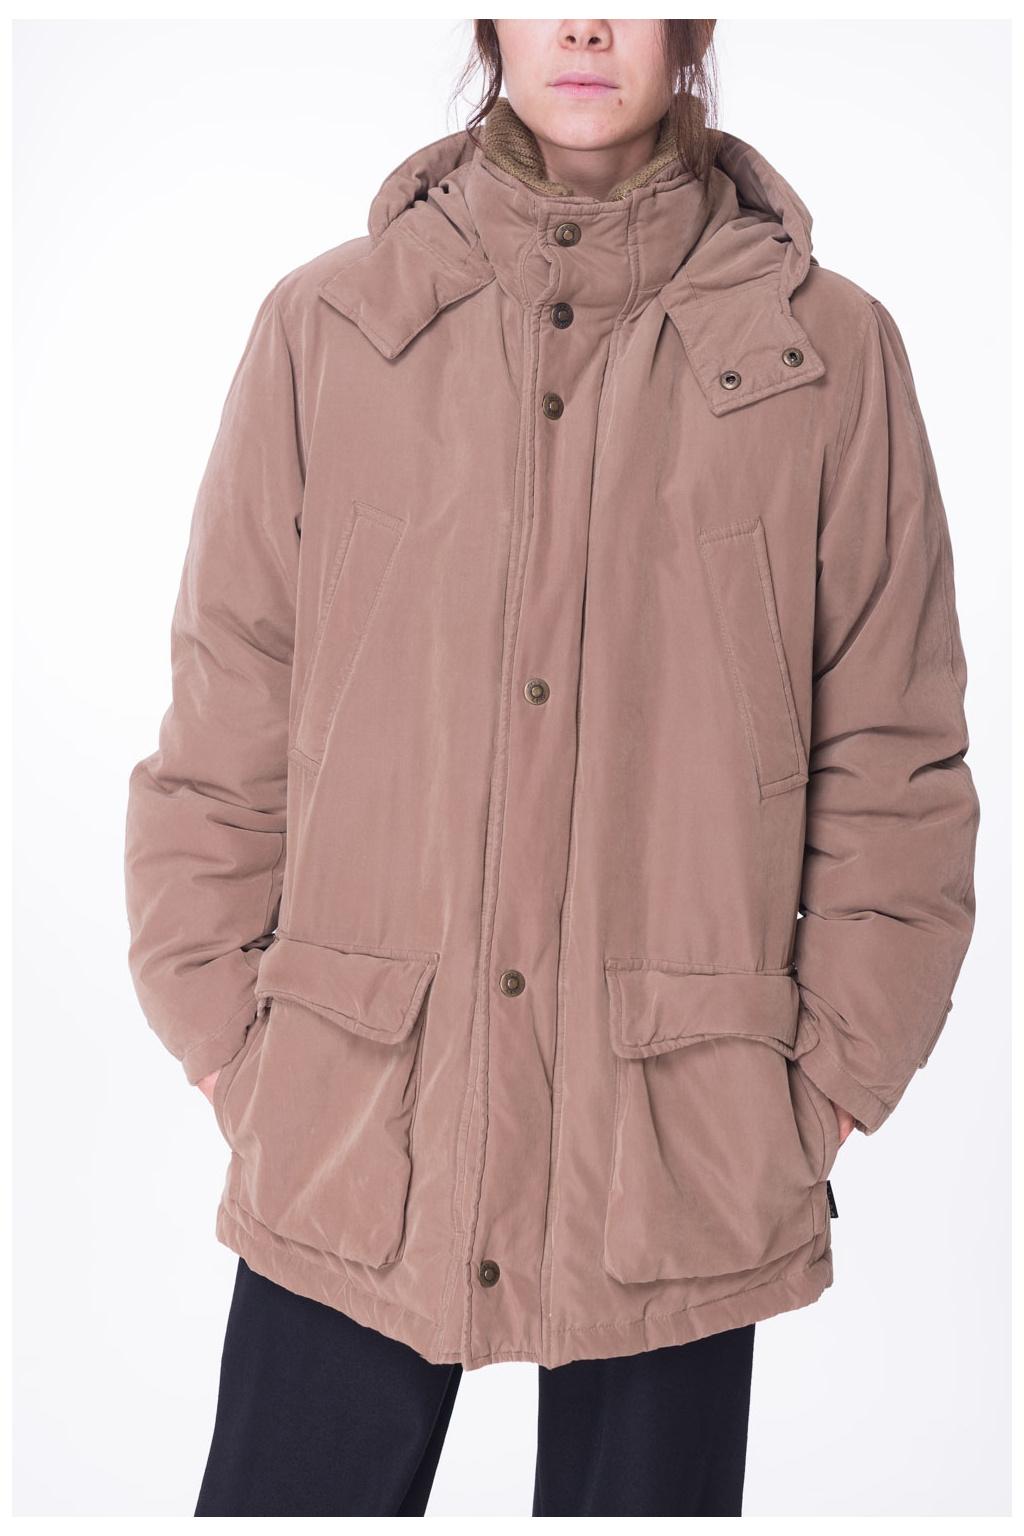 Kabát Hnědý